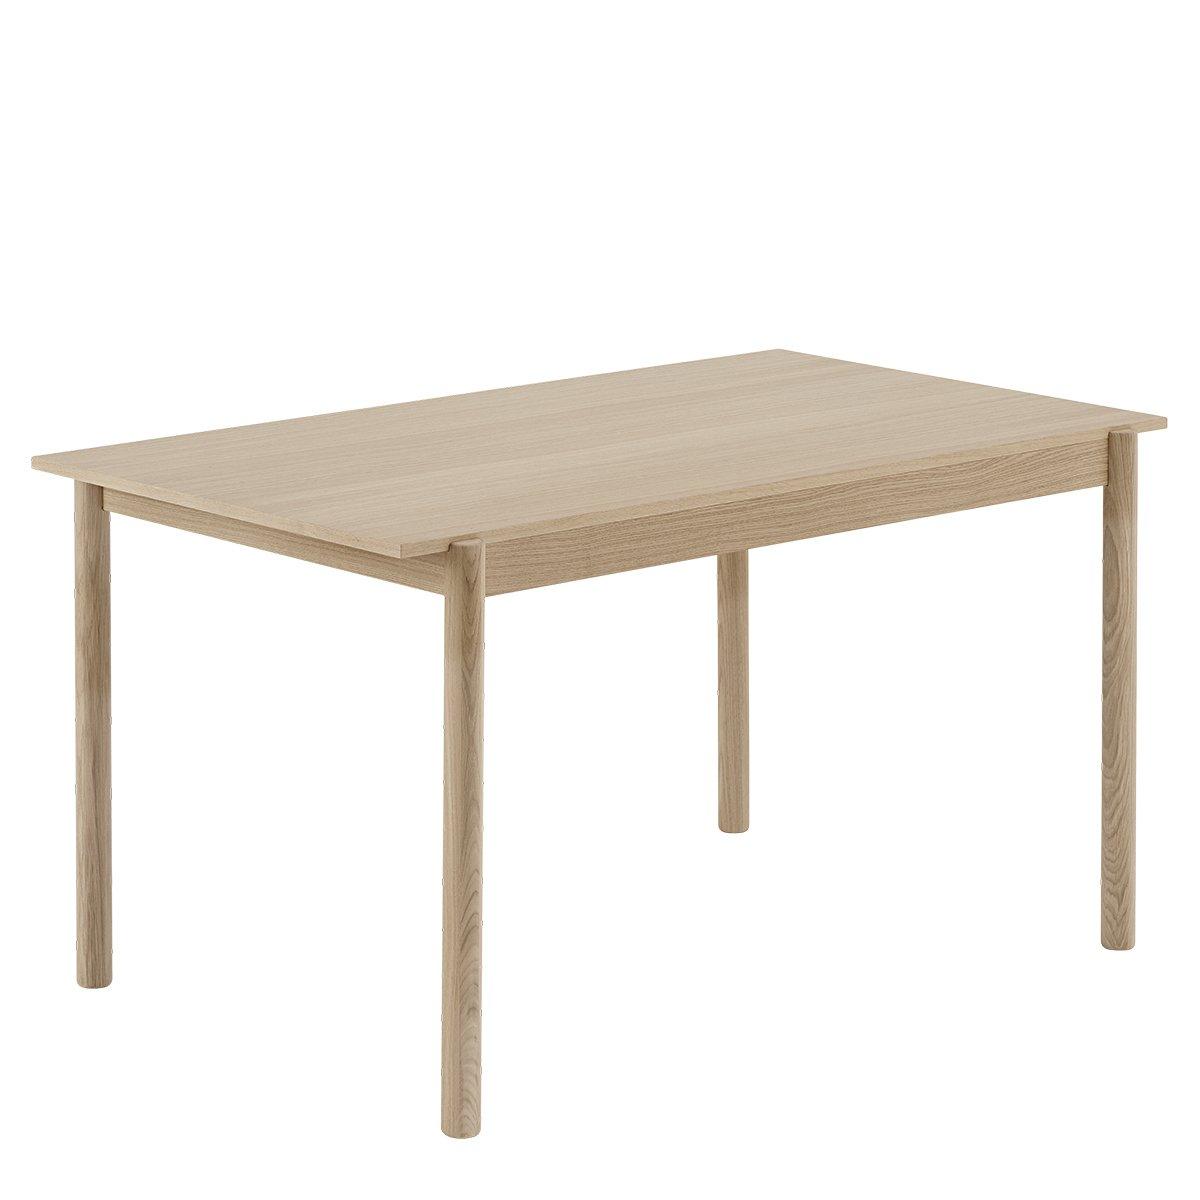 Muuto Linear Wood Eettafel - b. 140 x d. 85 cm.